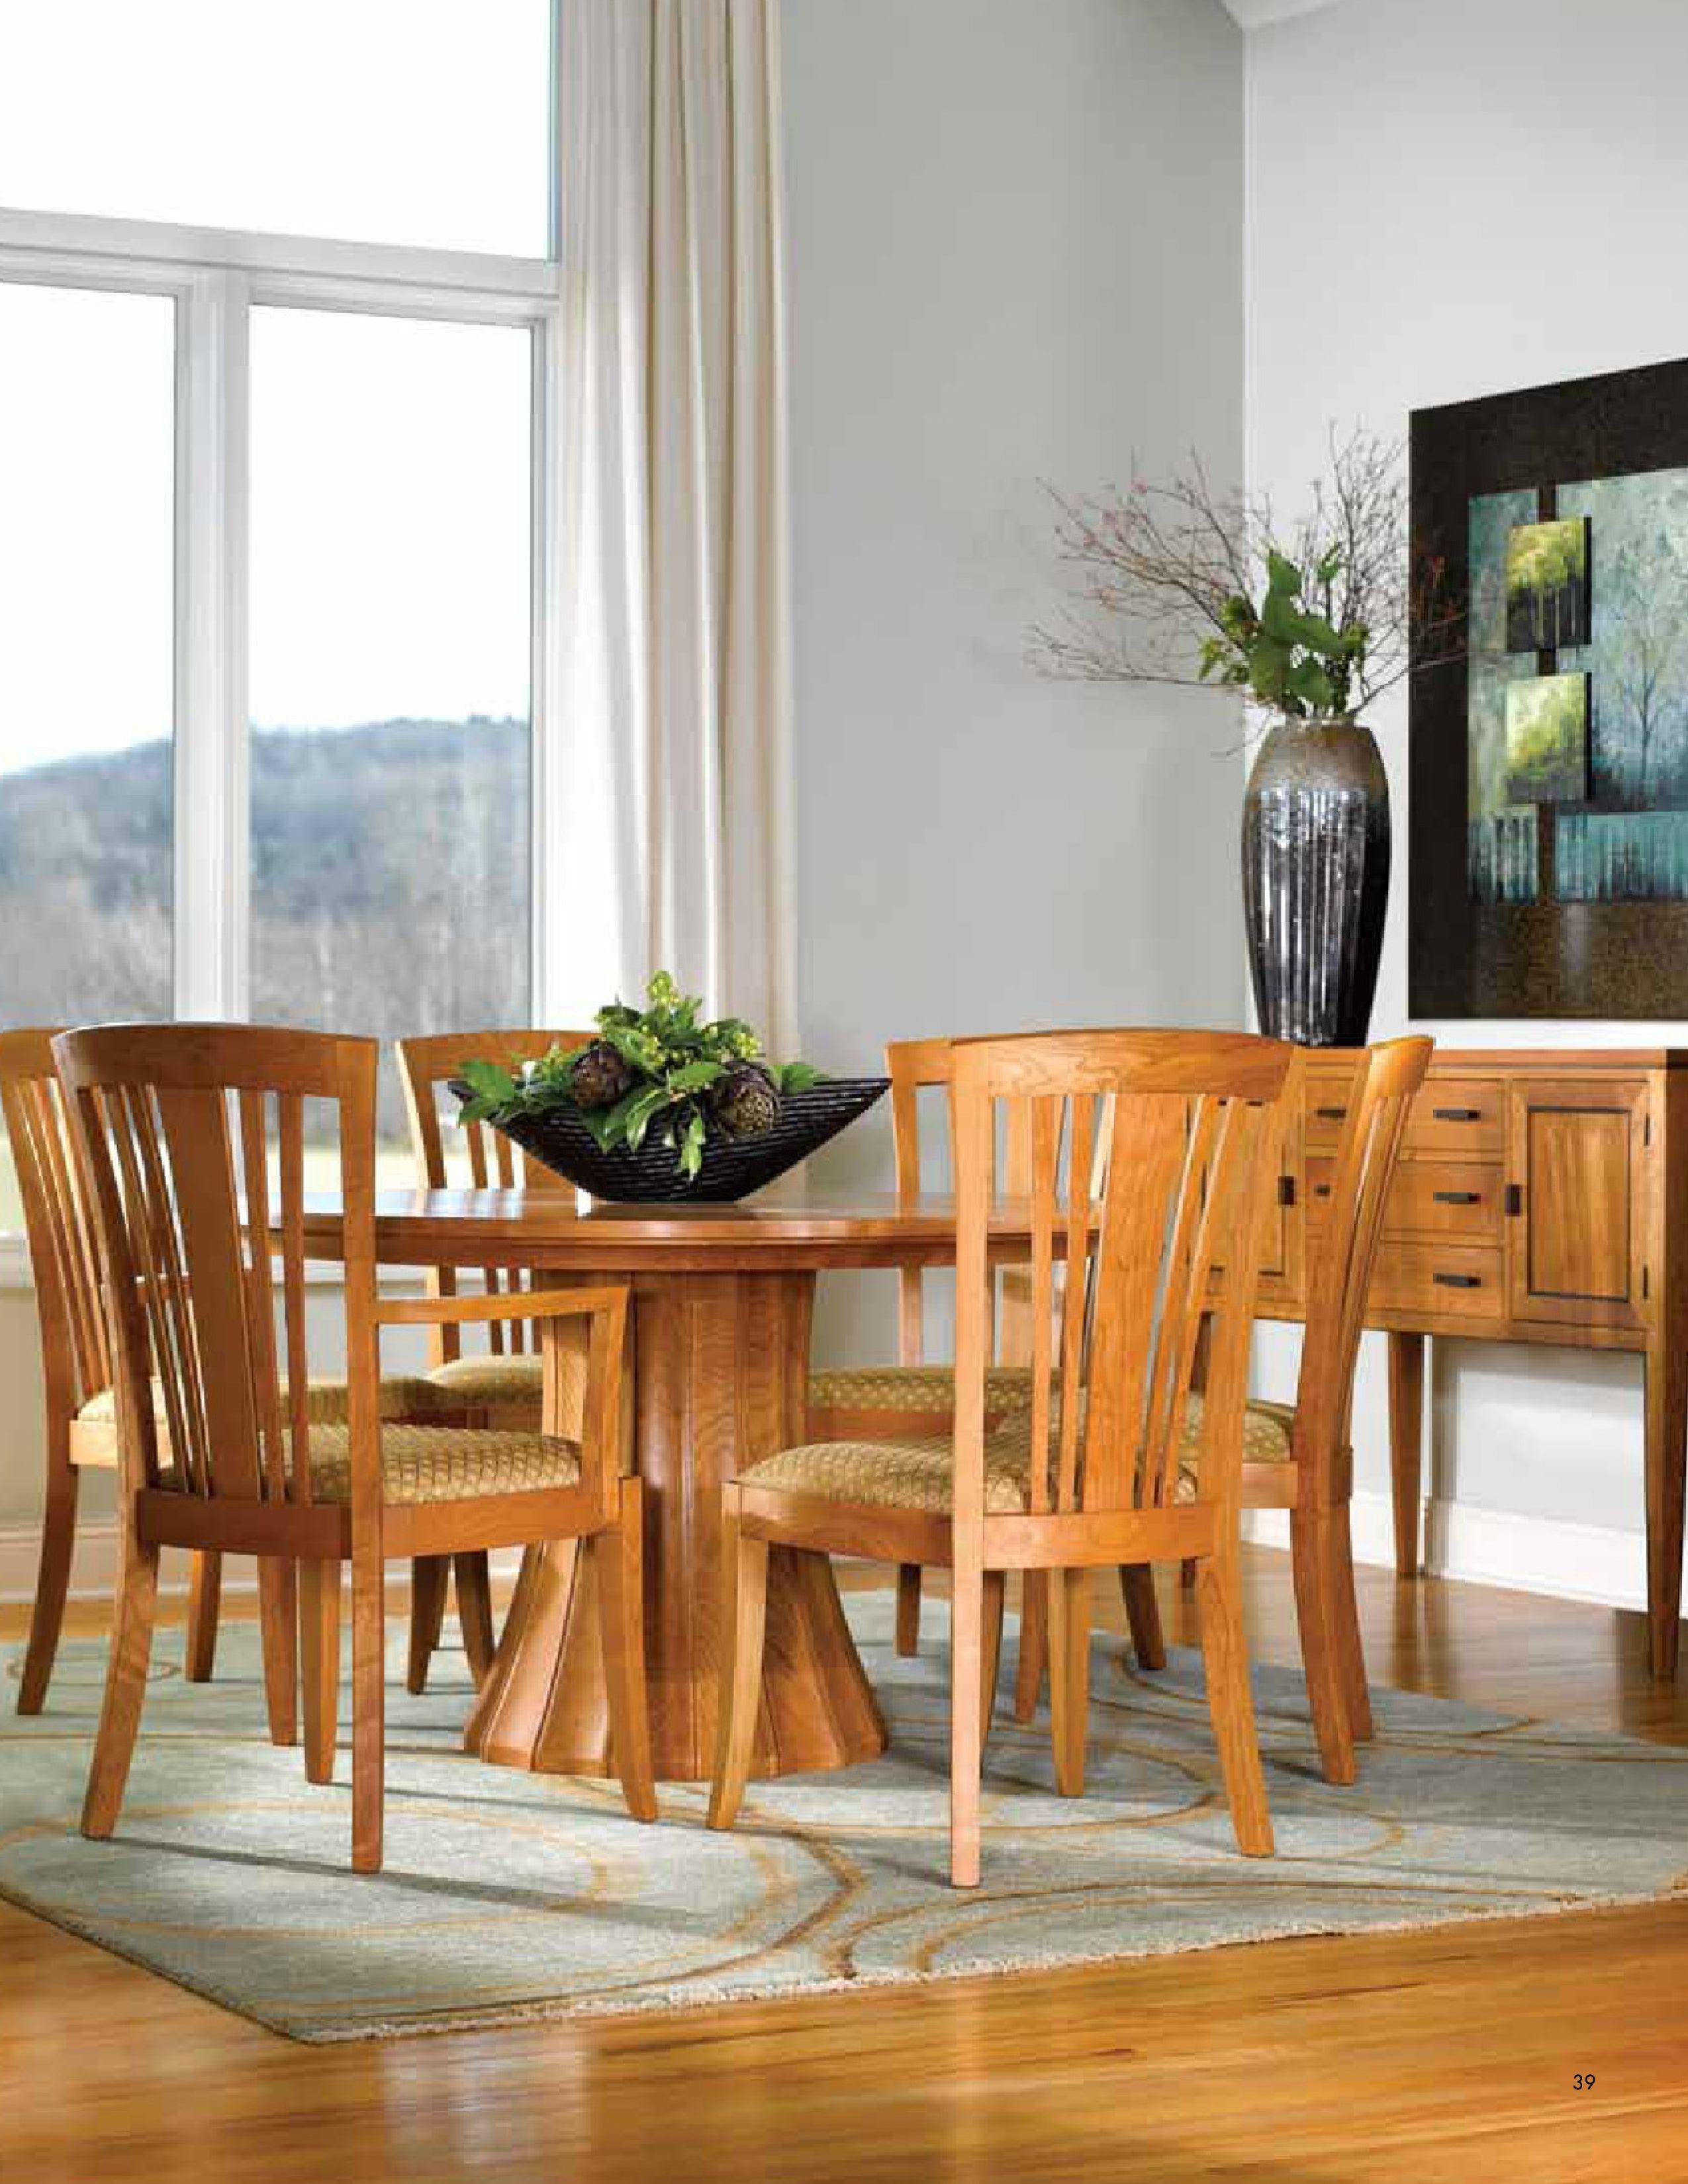 Stickley Dining Room Furniture: Stickley Modern Collection